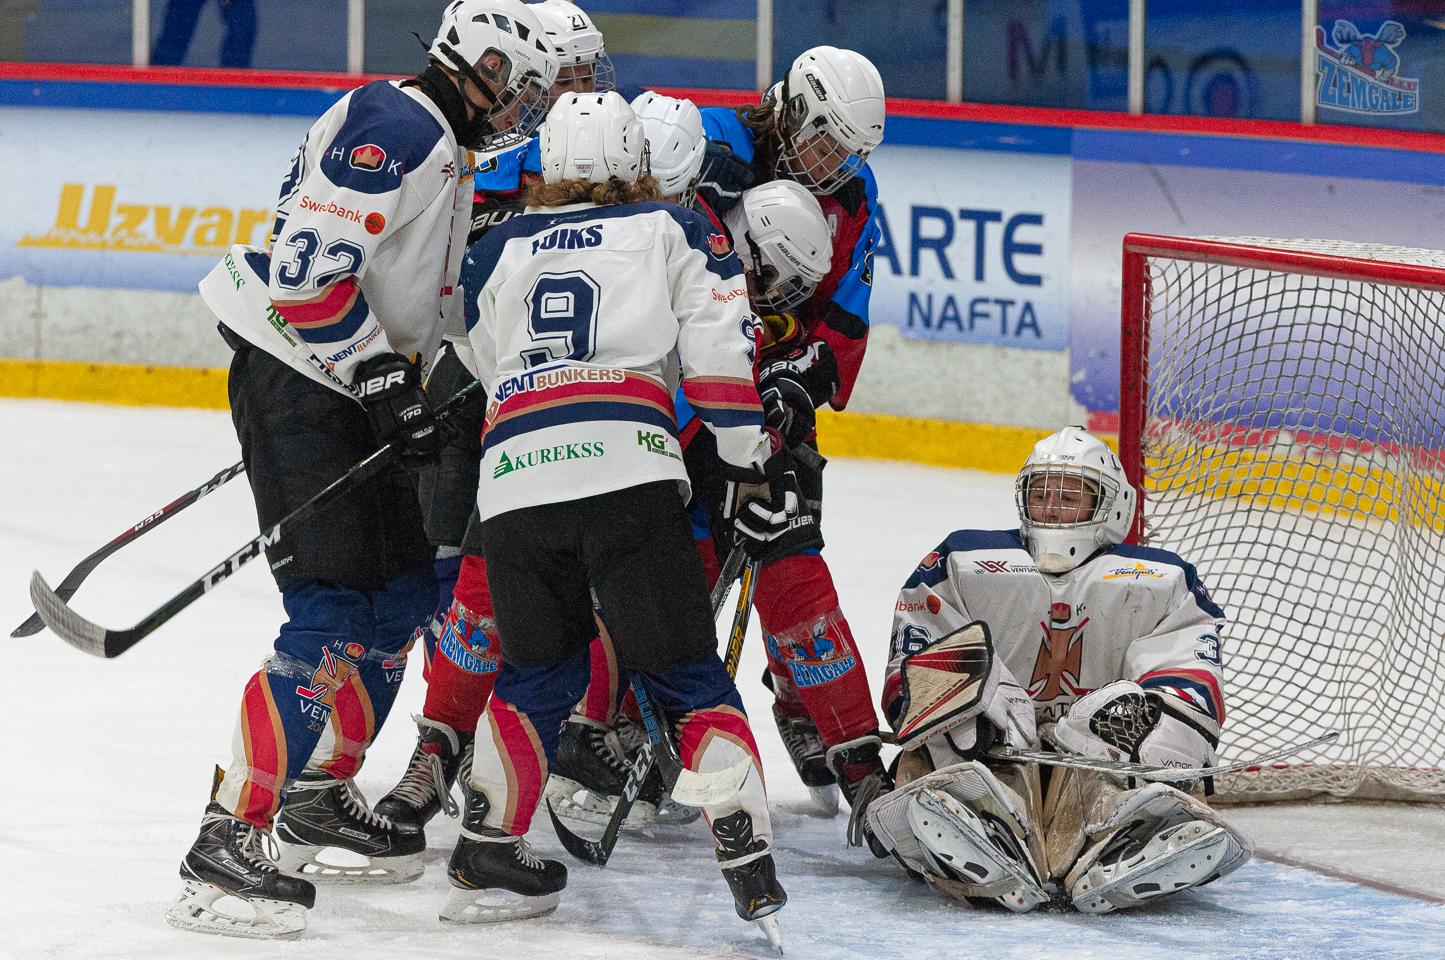 Jelgavas hokeja skola JLSS U17 - Venta 2002 14092019-30